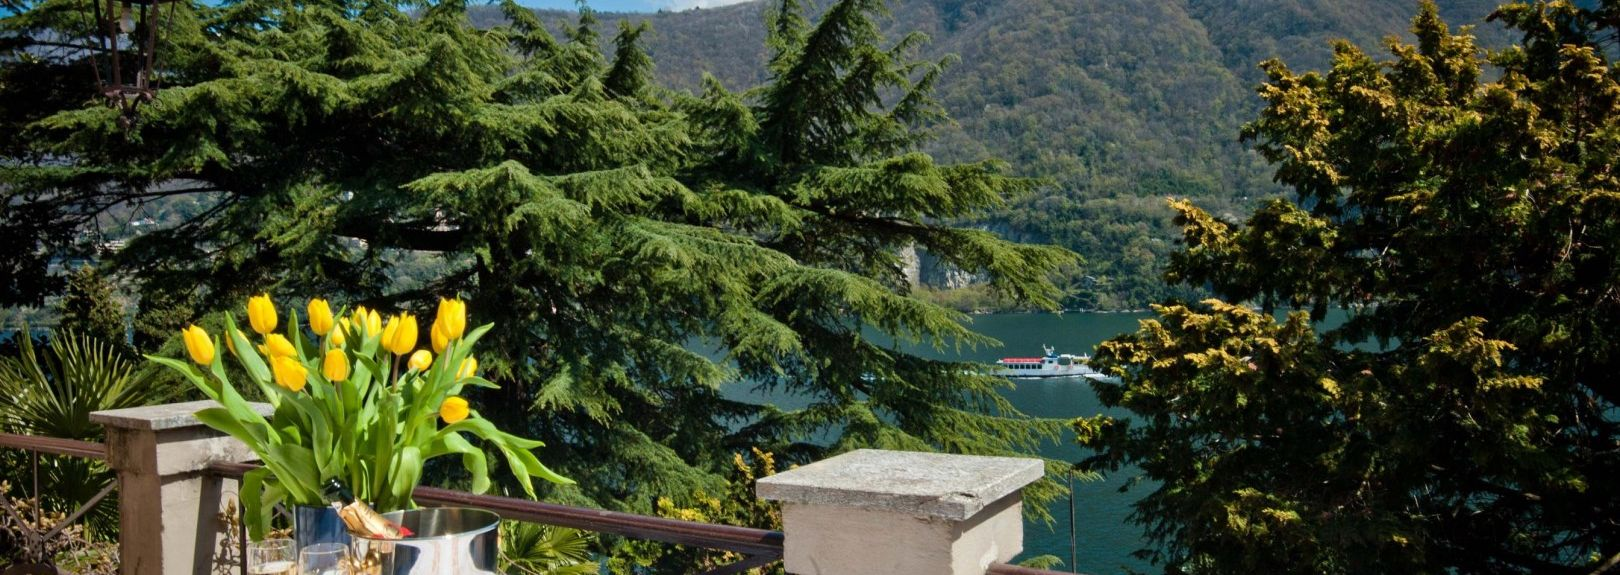 Fino Mornasco, Como, Lombardy, Italy